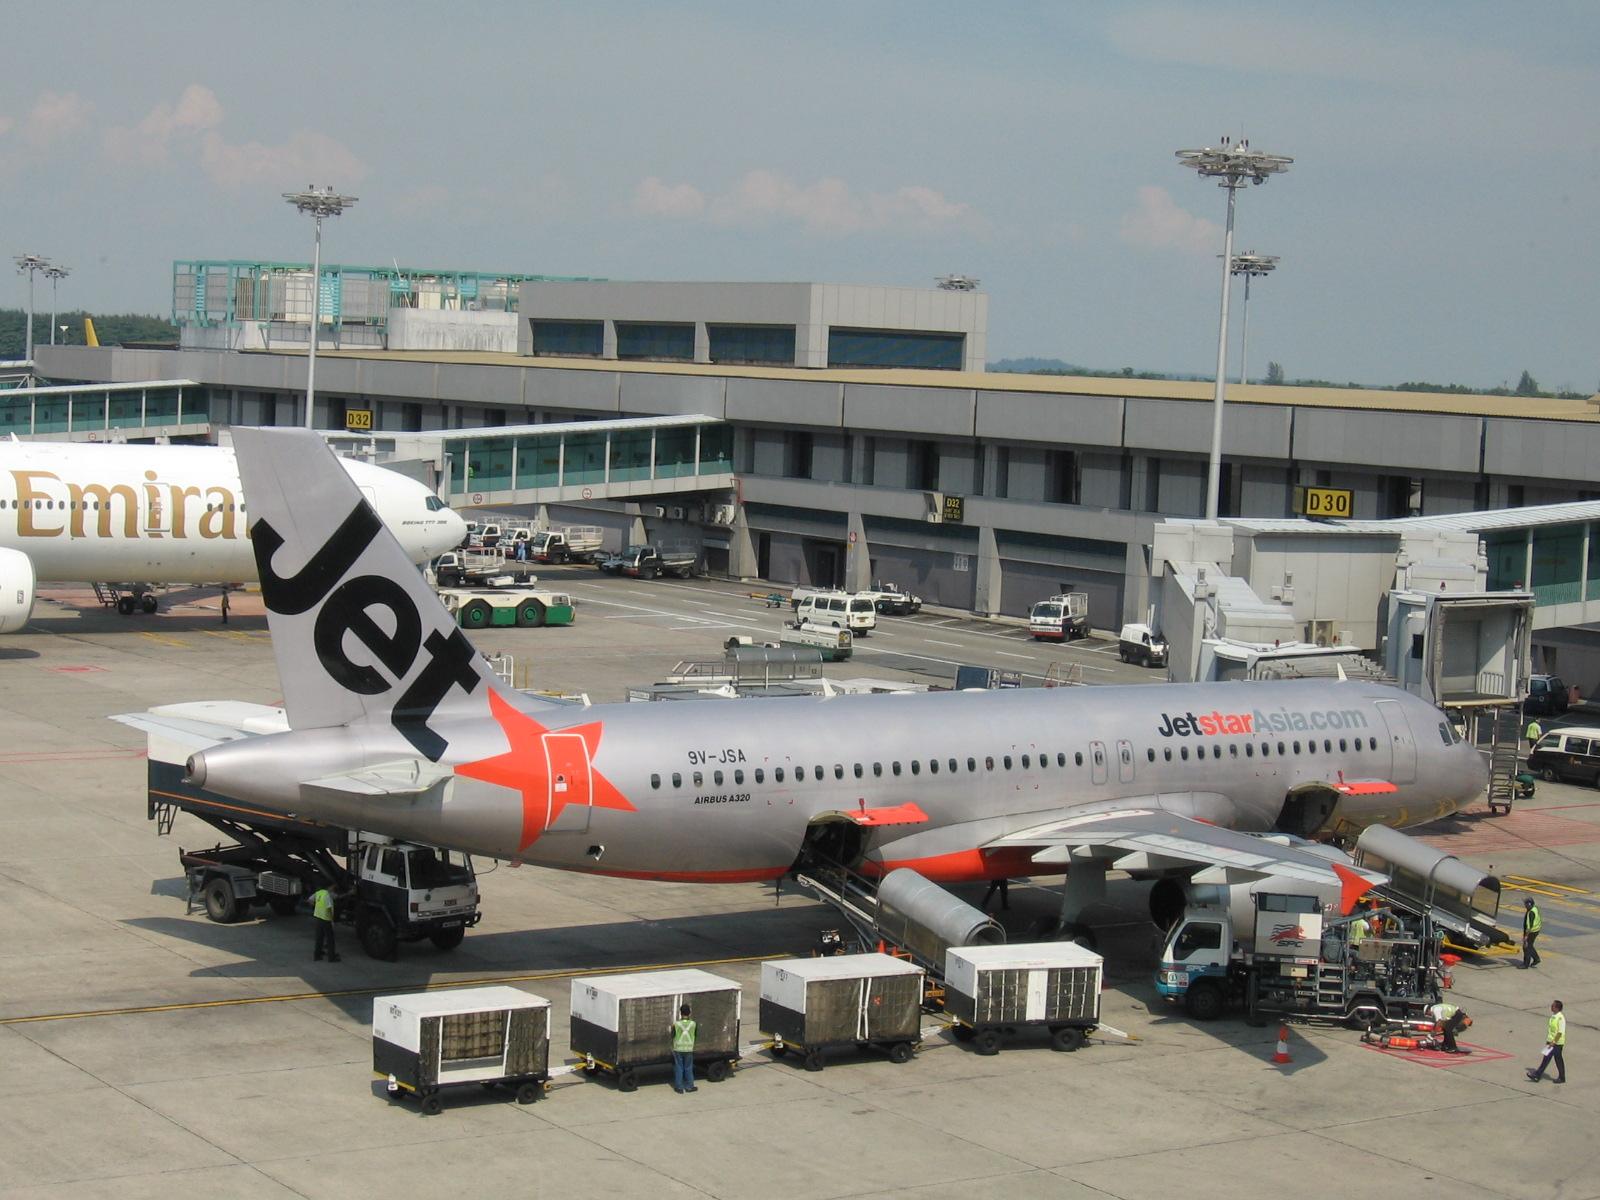 Singapore Changi Airport Hotel Terminal